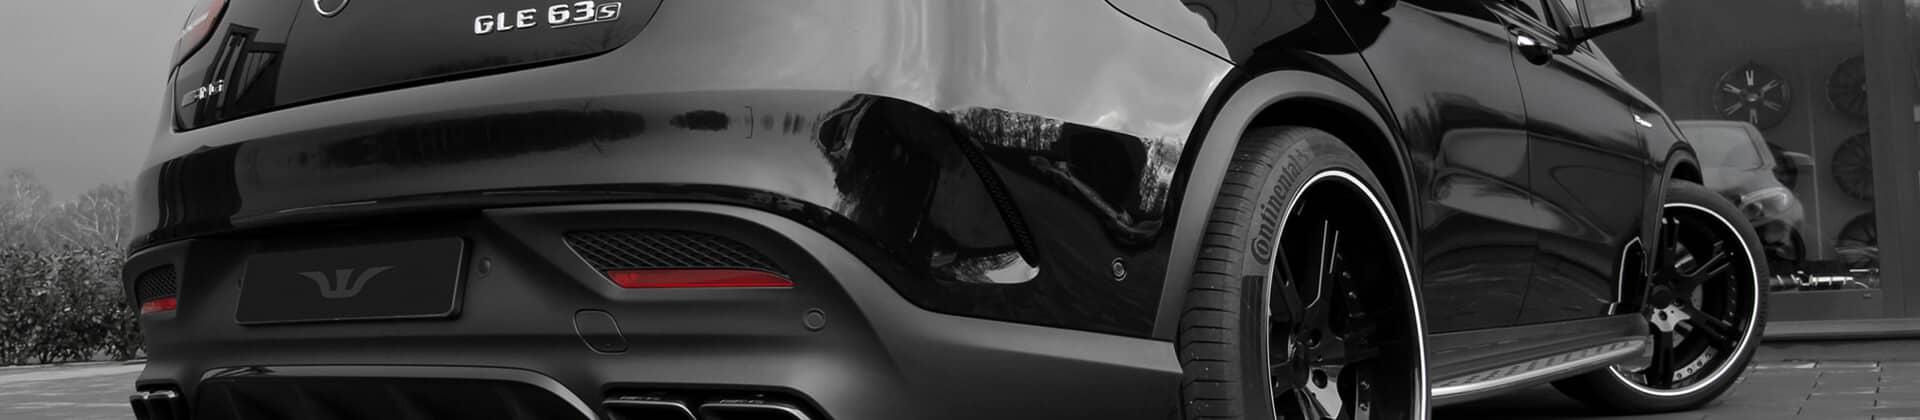 Mercedes GLE63 AMG leistungssteigerung